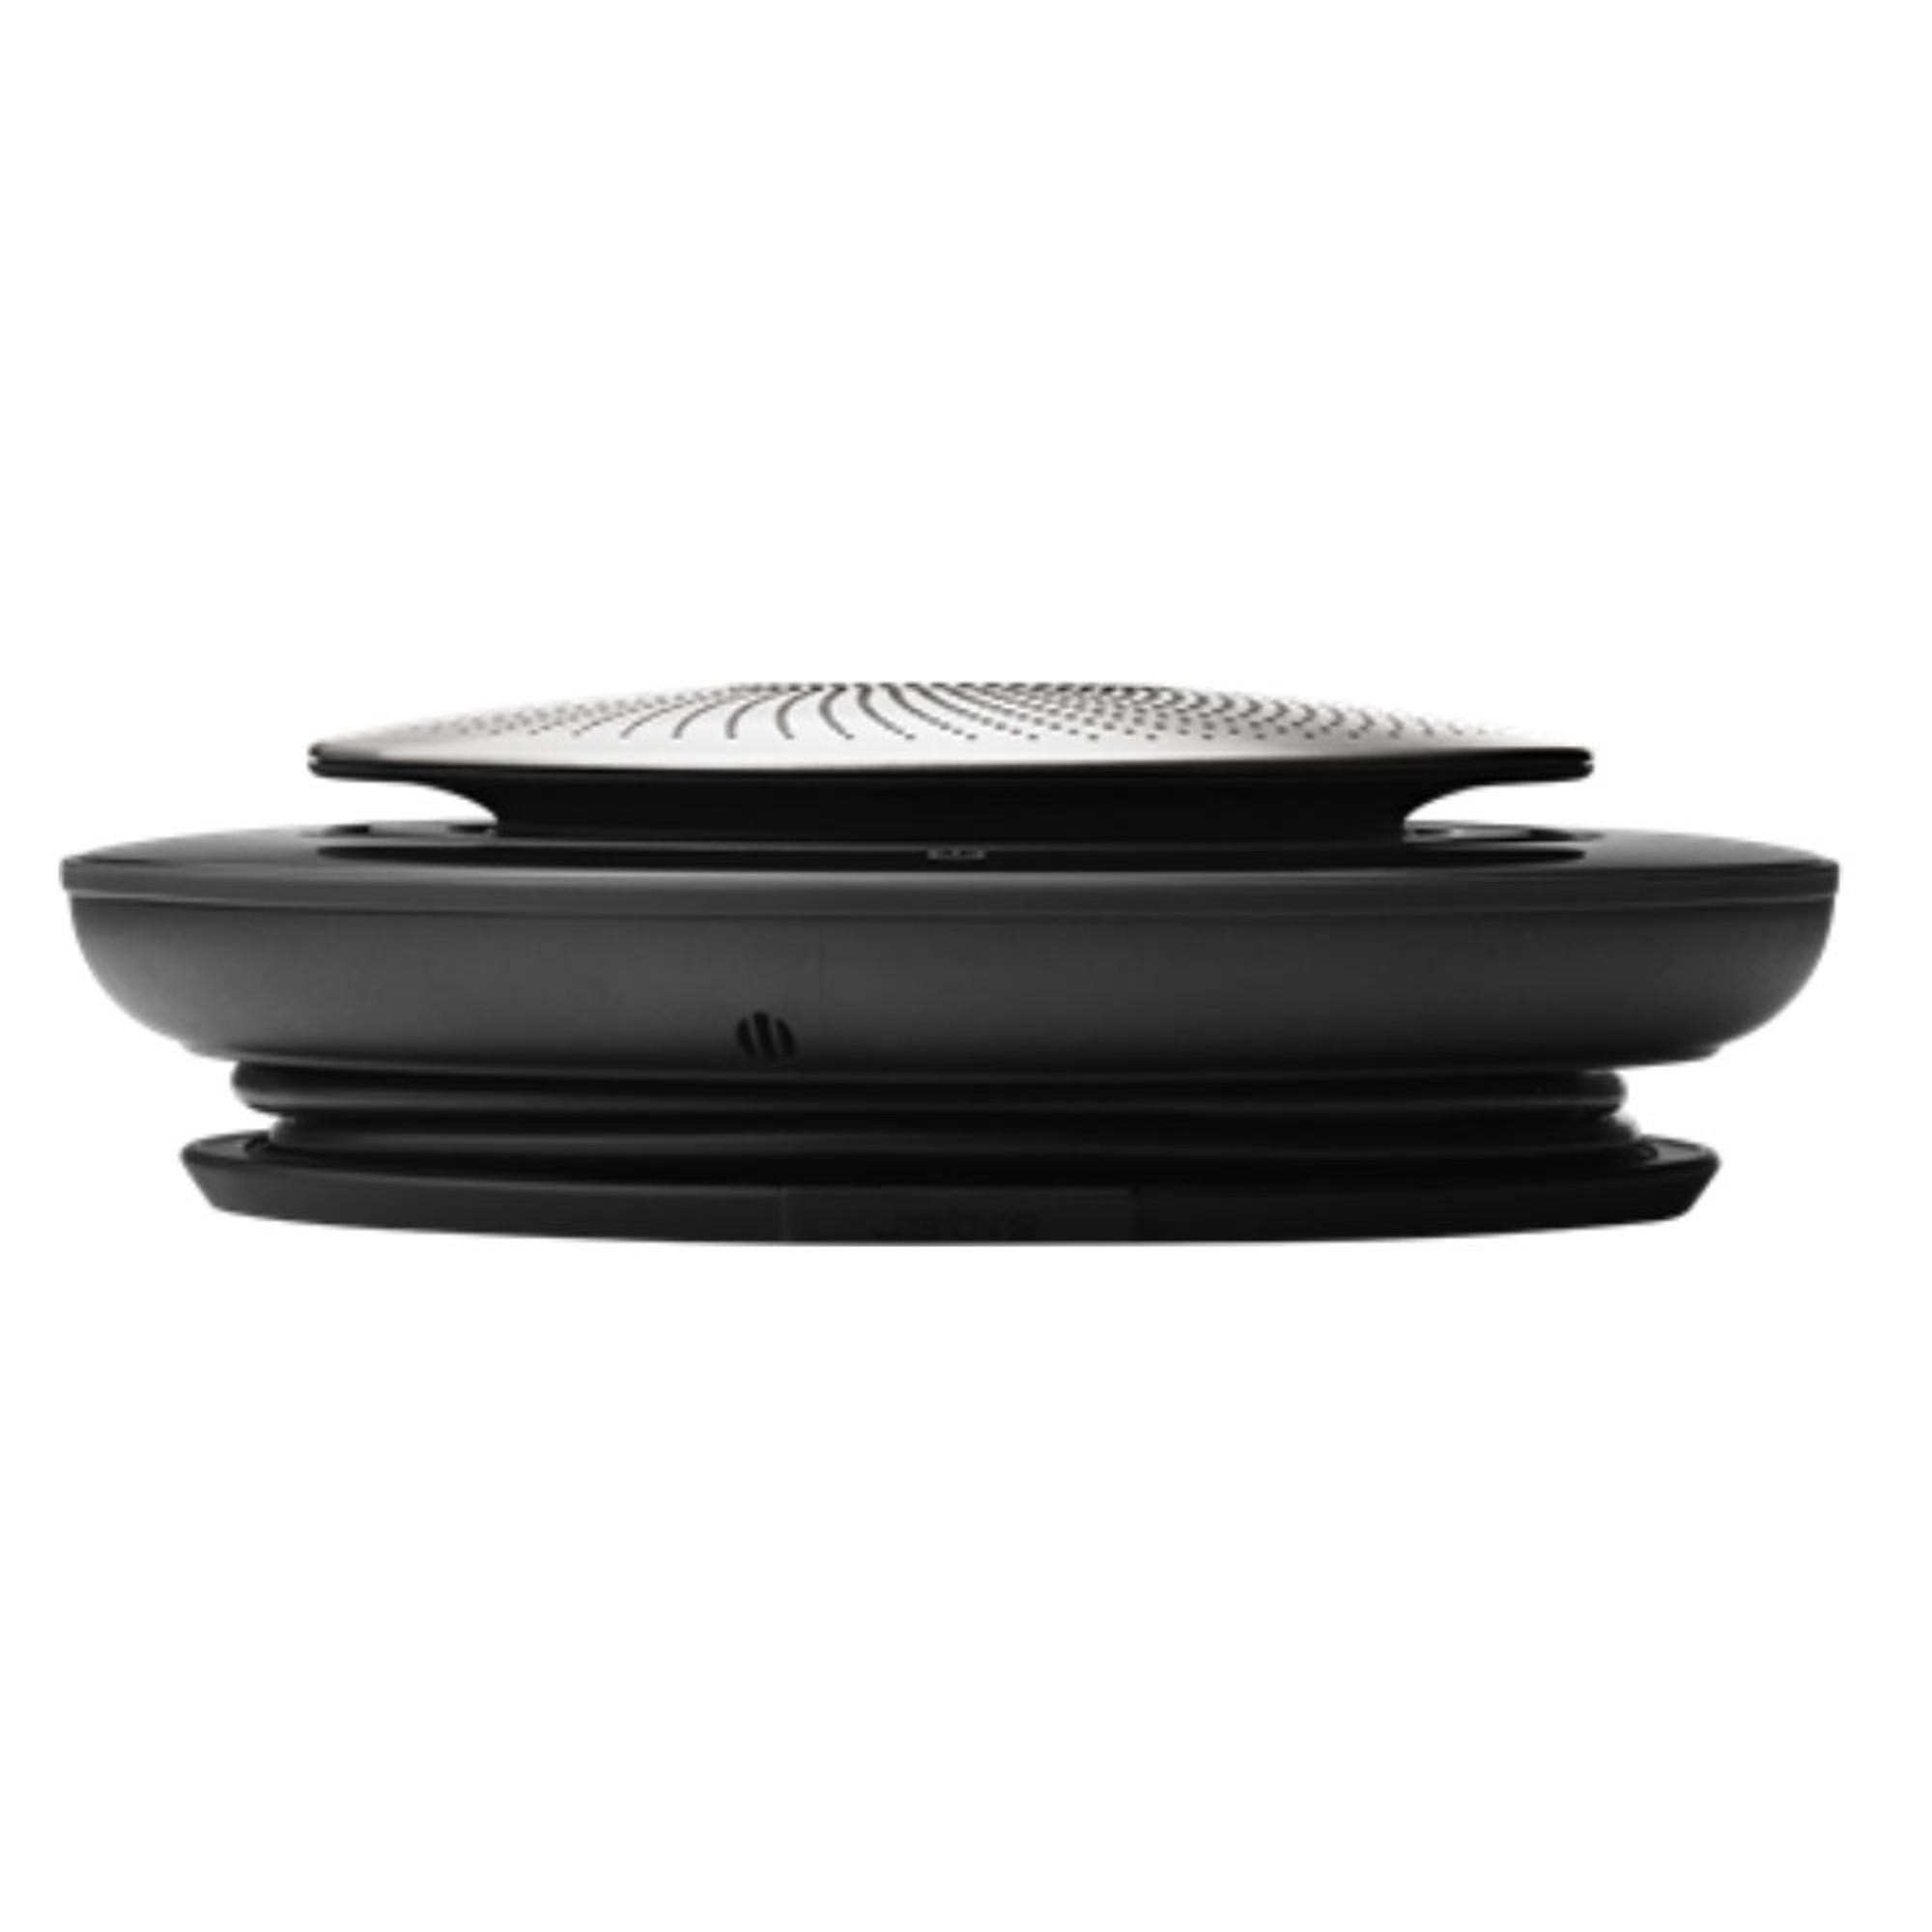 1526ab0b703 ... Jabra Speak 710 MS Wireless HD Conference Speakerphone With Link 370  USB Adapter